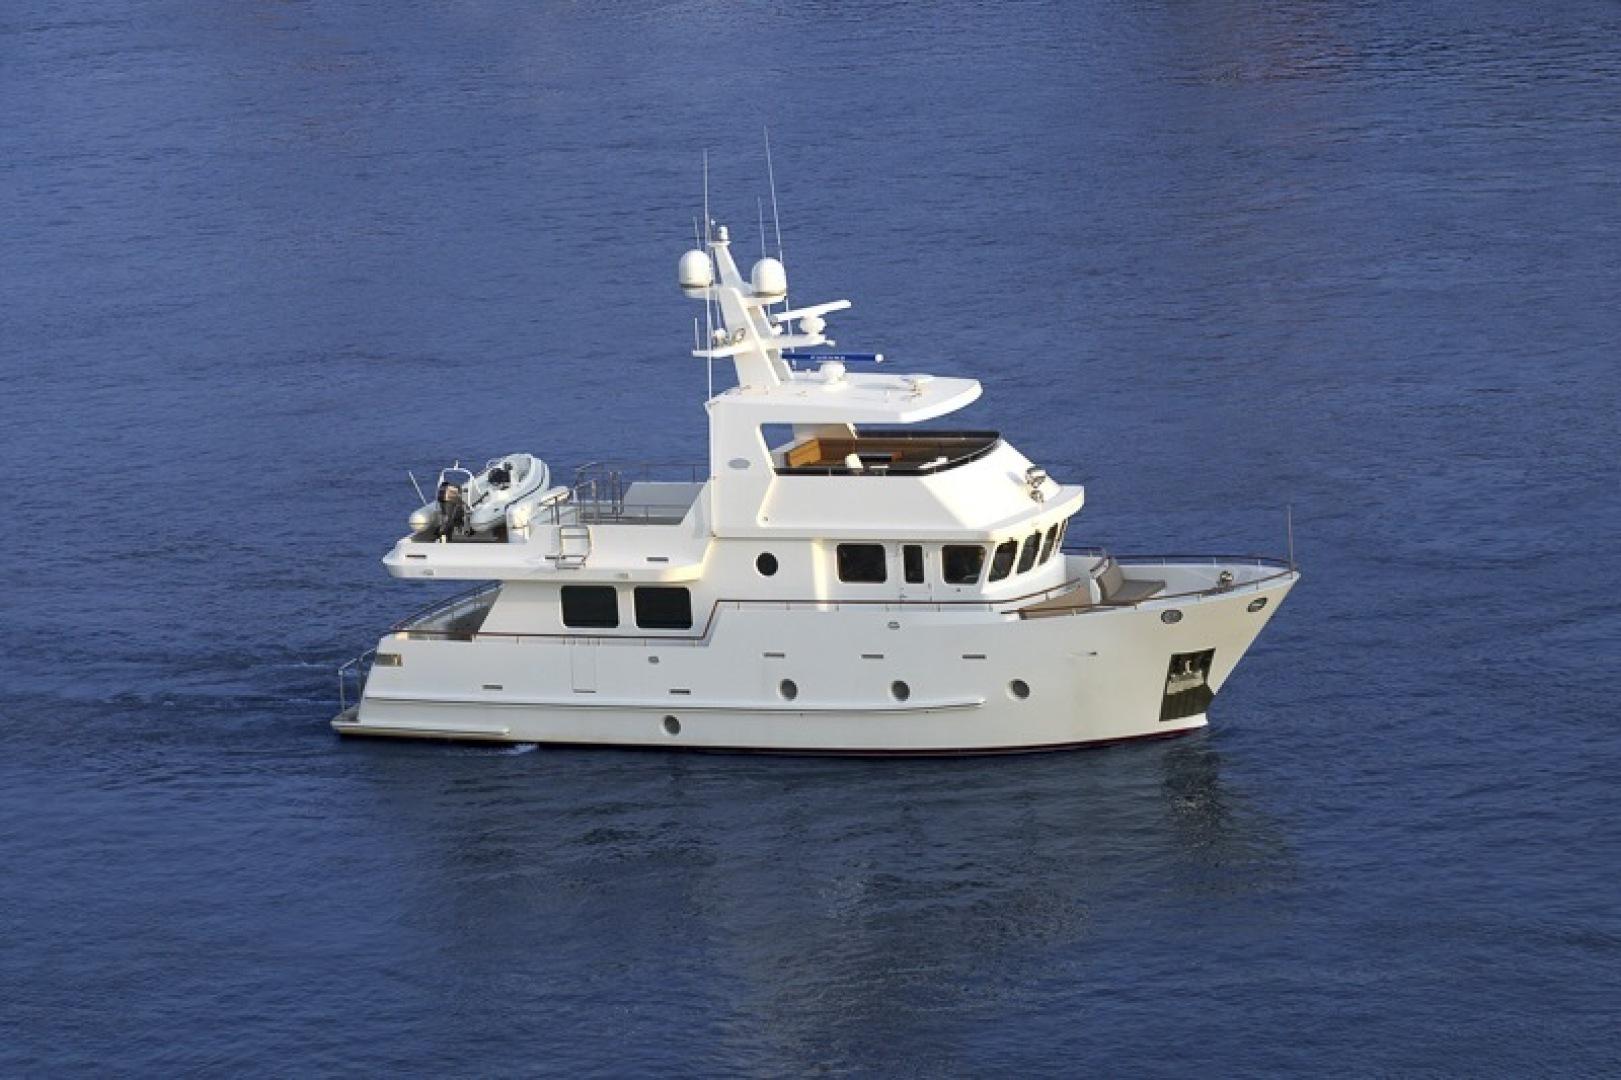 Bering-65 Bering Yacht 2013-Namaste Dania-Florida-United States-1401069   Thumbnail